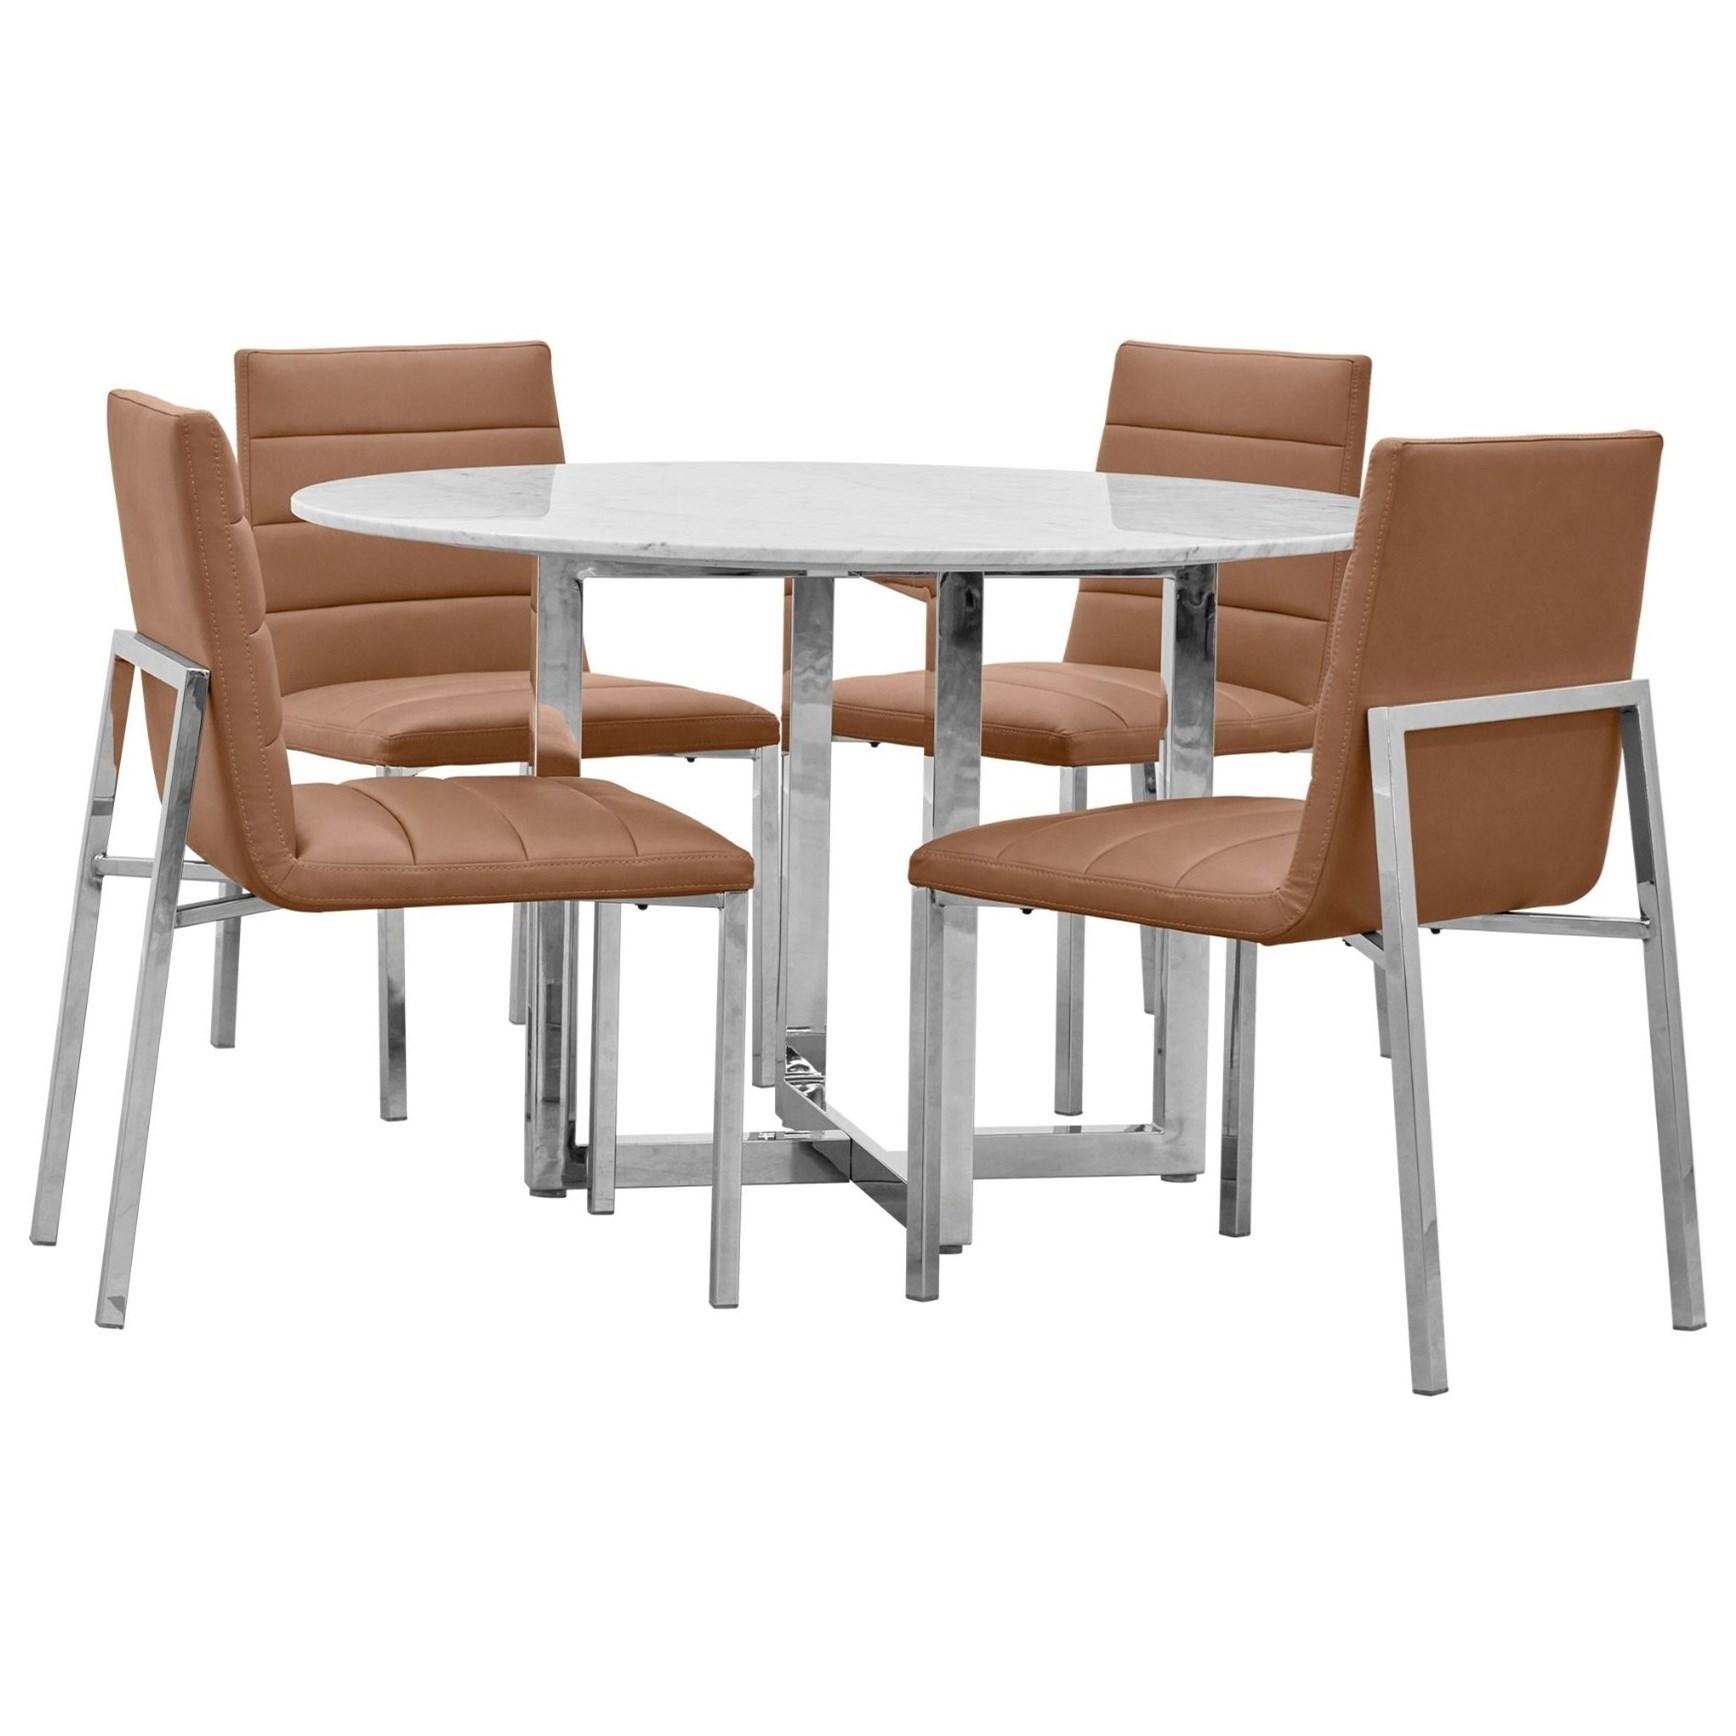 Amalfi 5-Piece Table Set by Modus International at A1 Furniture & Mattress